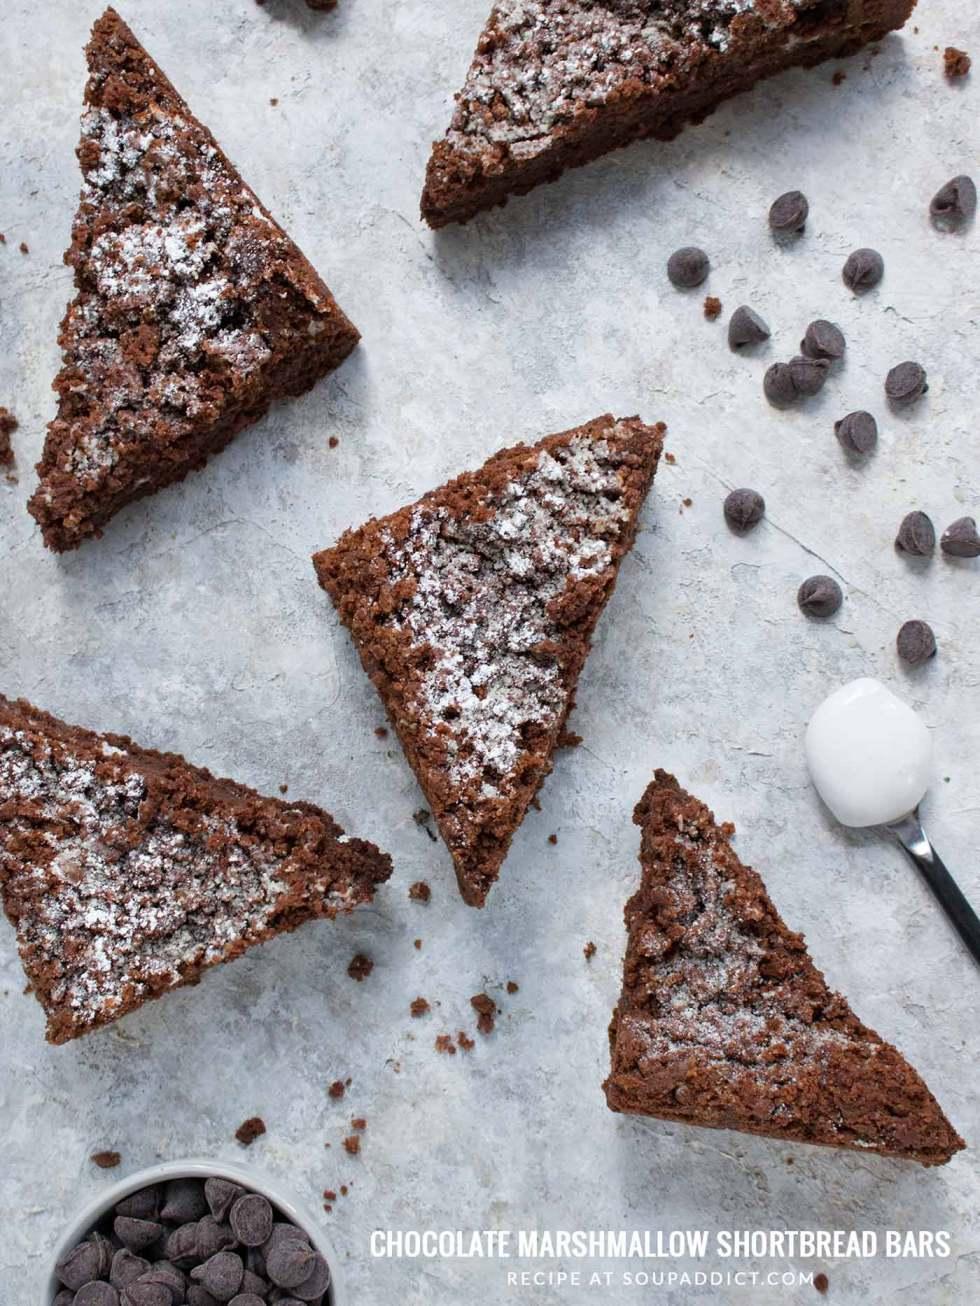 Chocolate Marshmallow Shortbread Bars - Recipe at SoupAddict.com